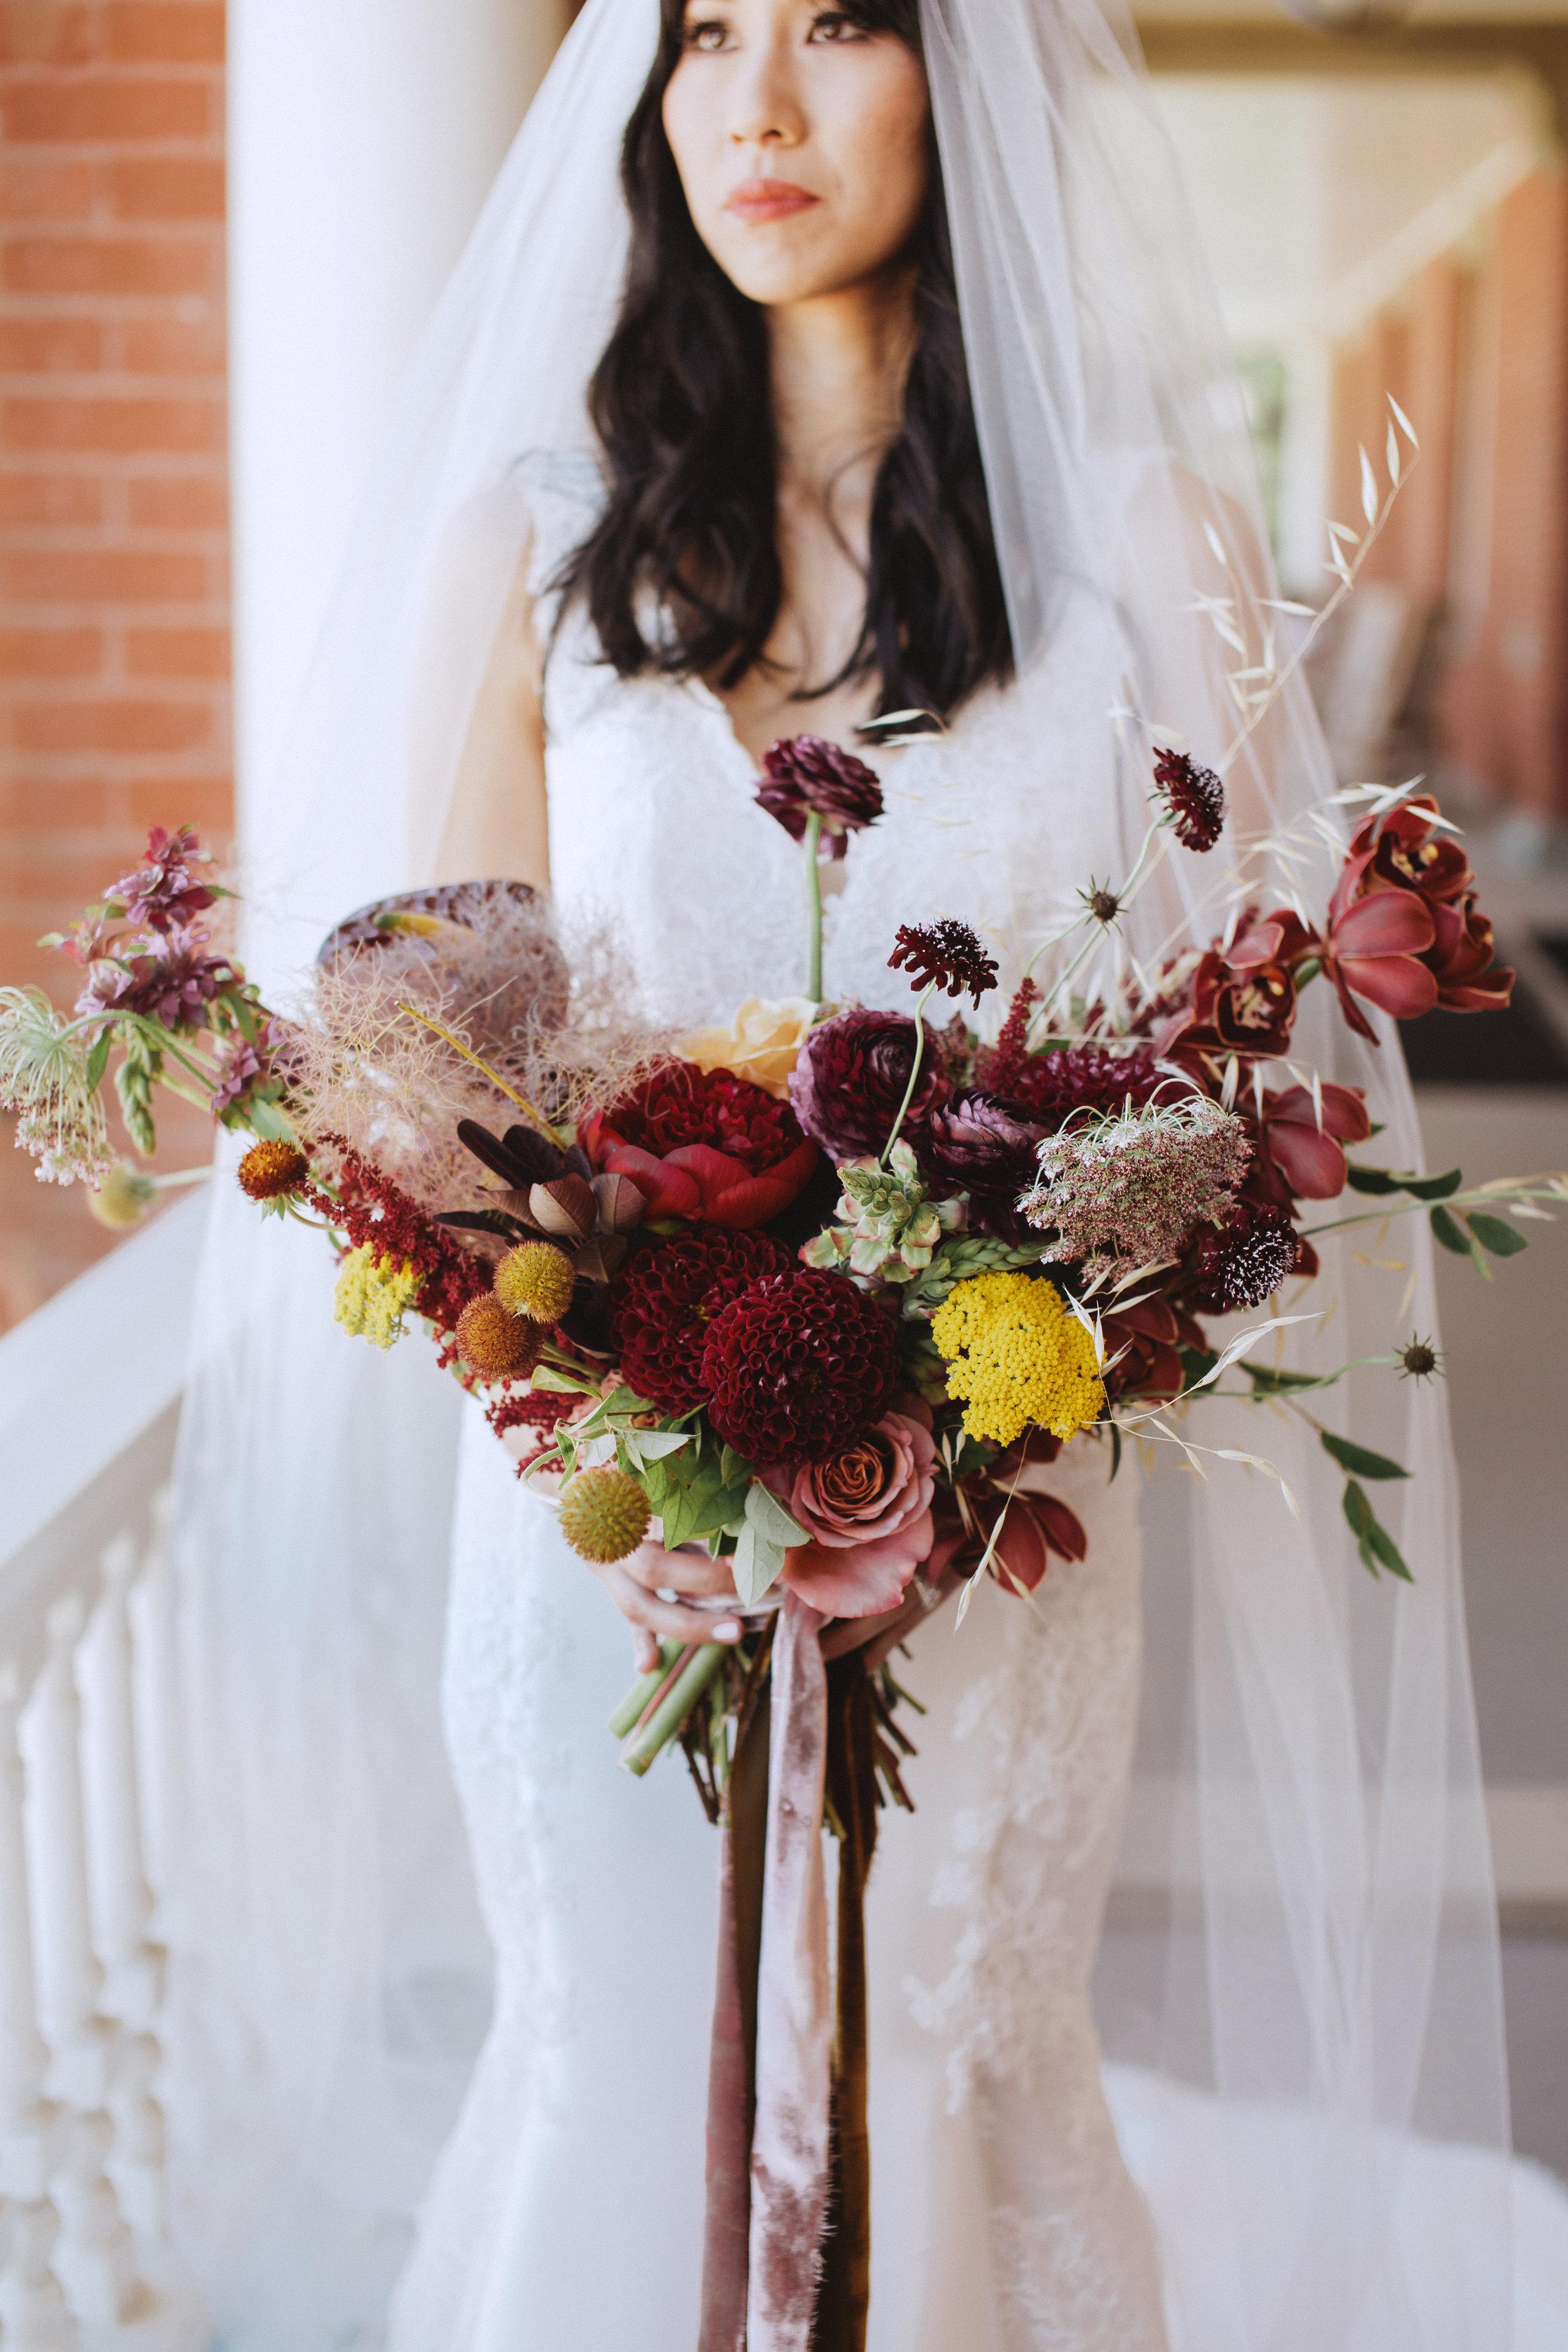 beautiful silk velvet bouquet and wedding gown idea